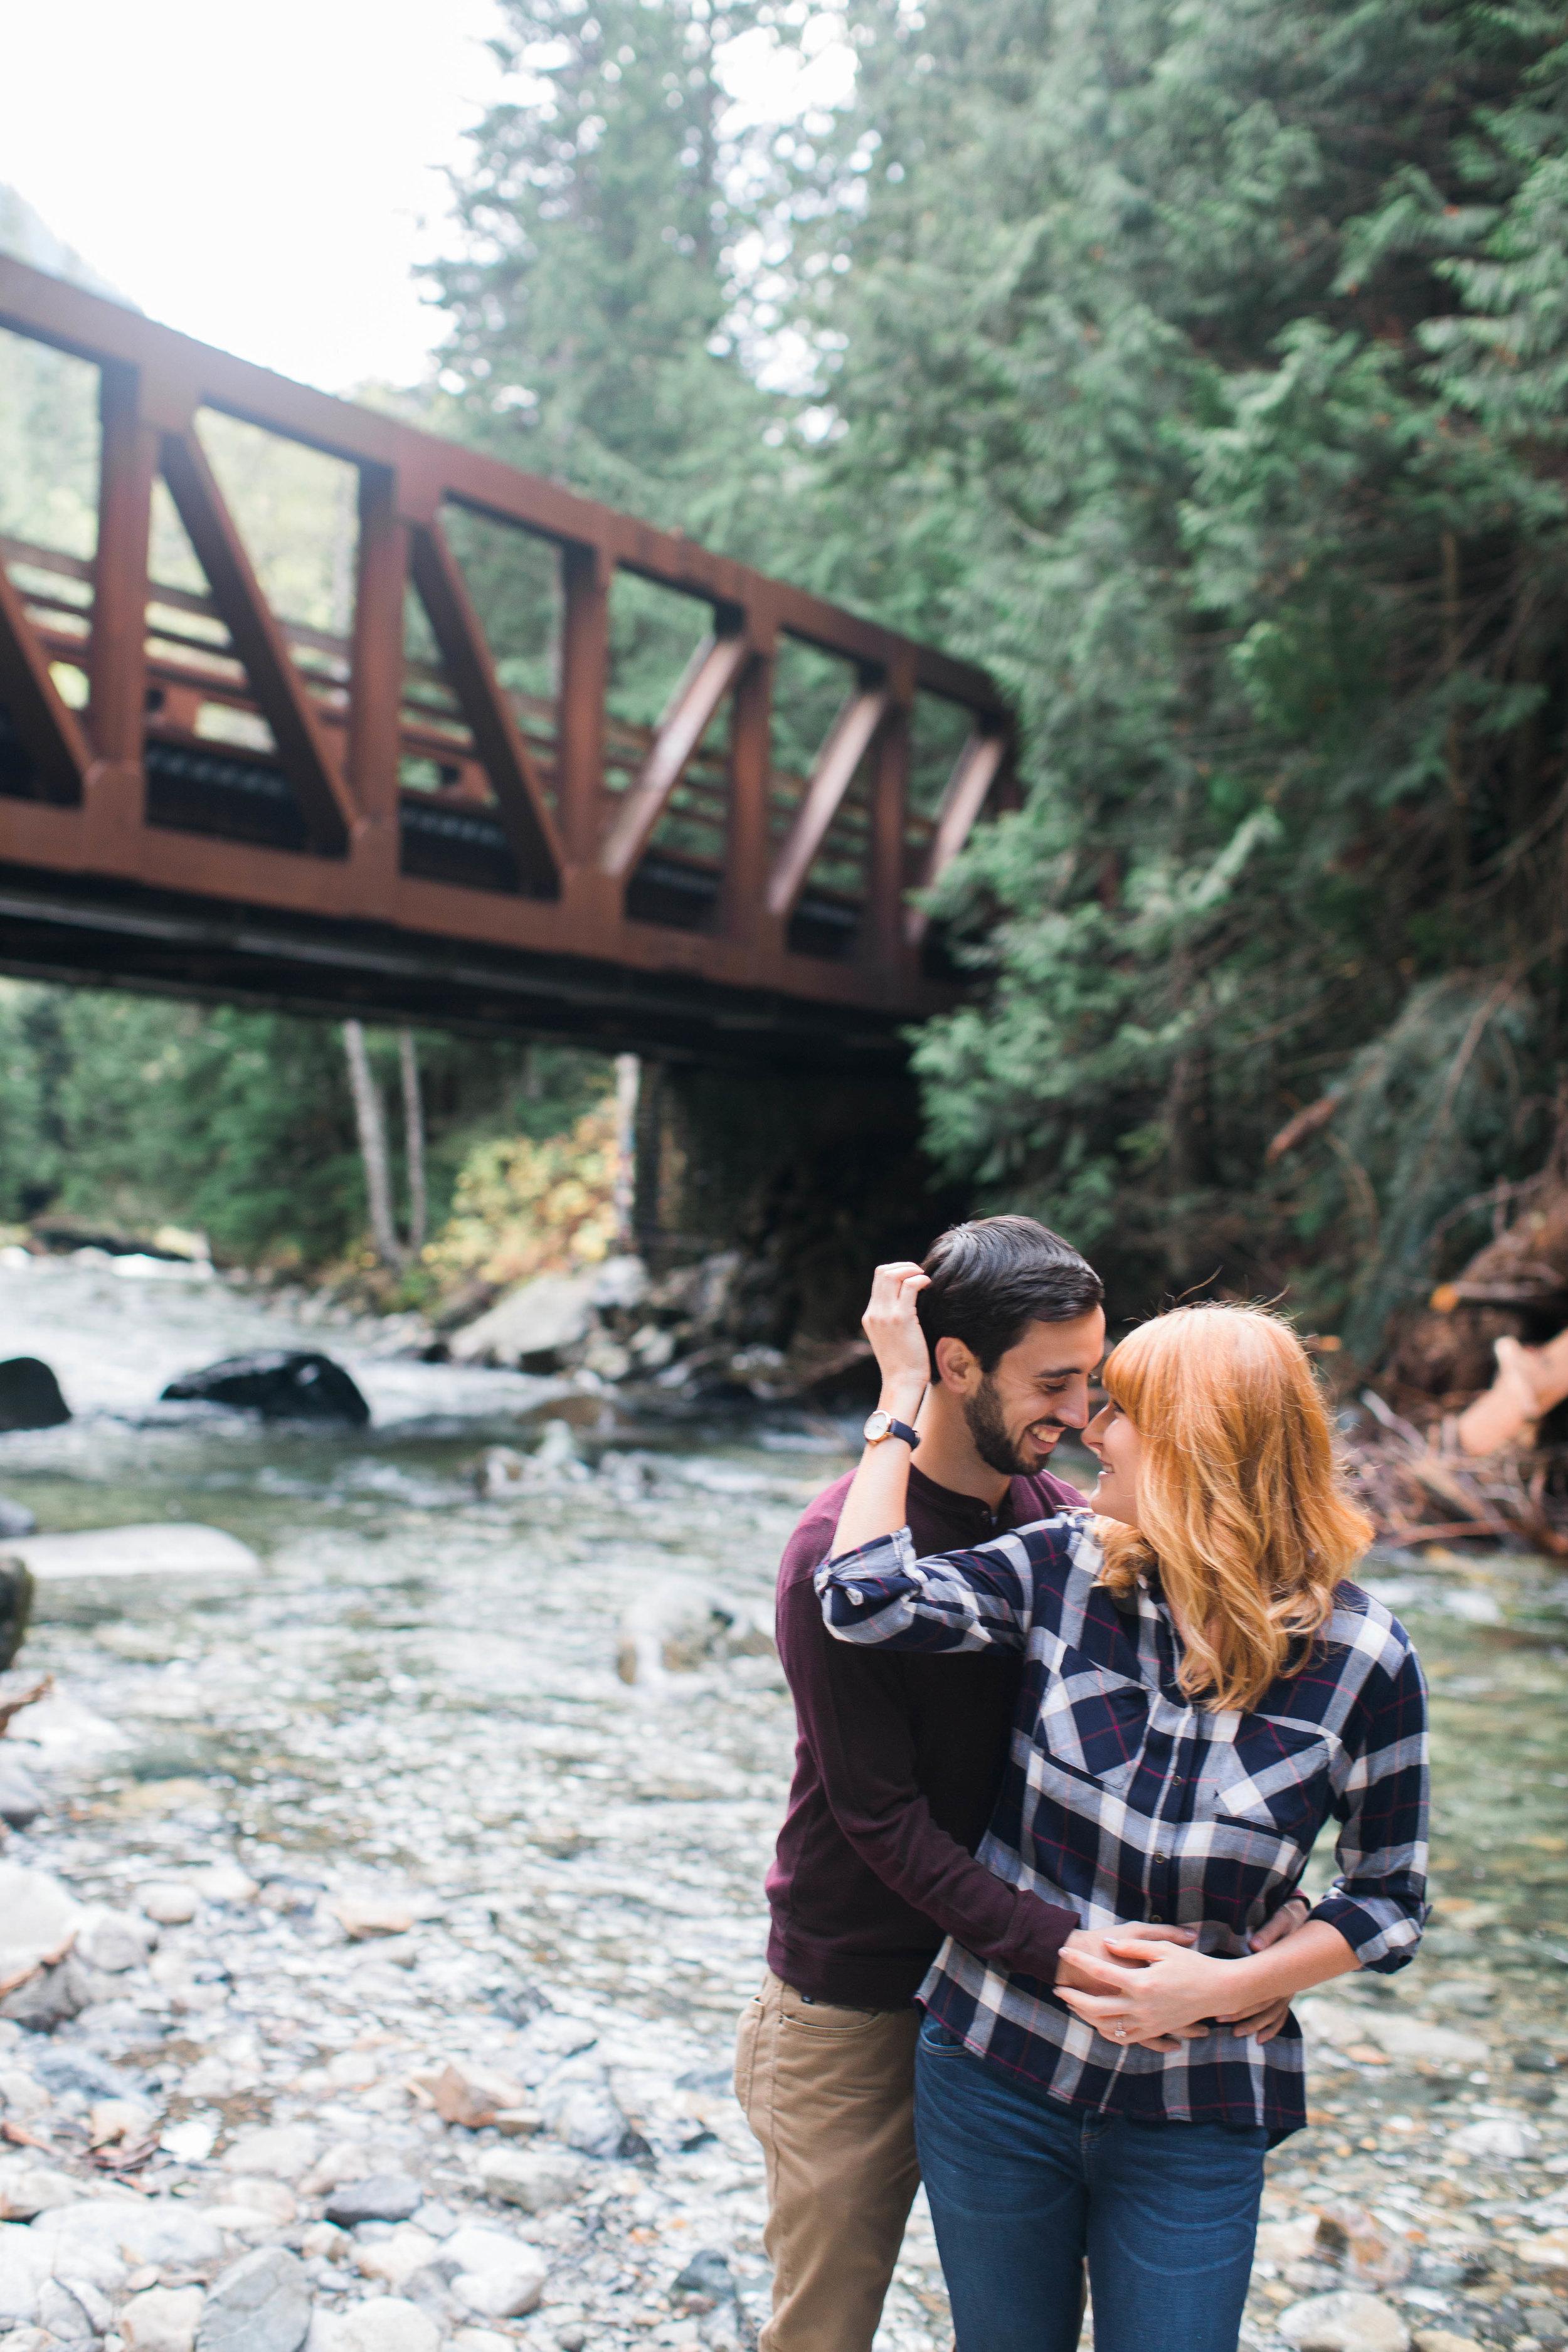 Ryan+Nicole_Franklin+Falls+Engagement_APW2016_16.JPG